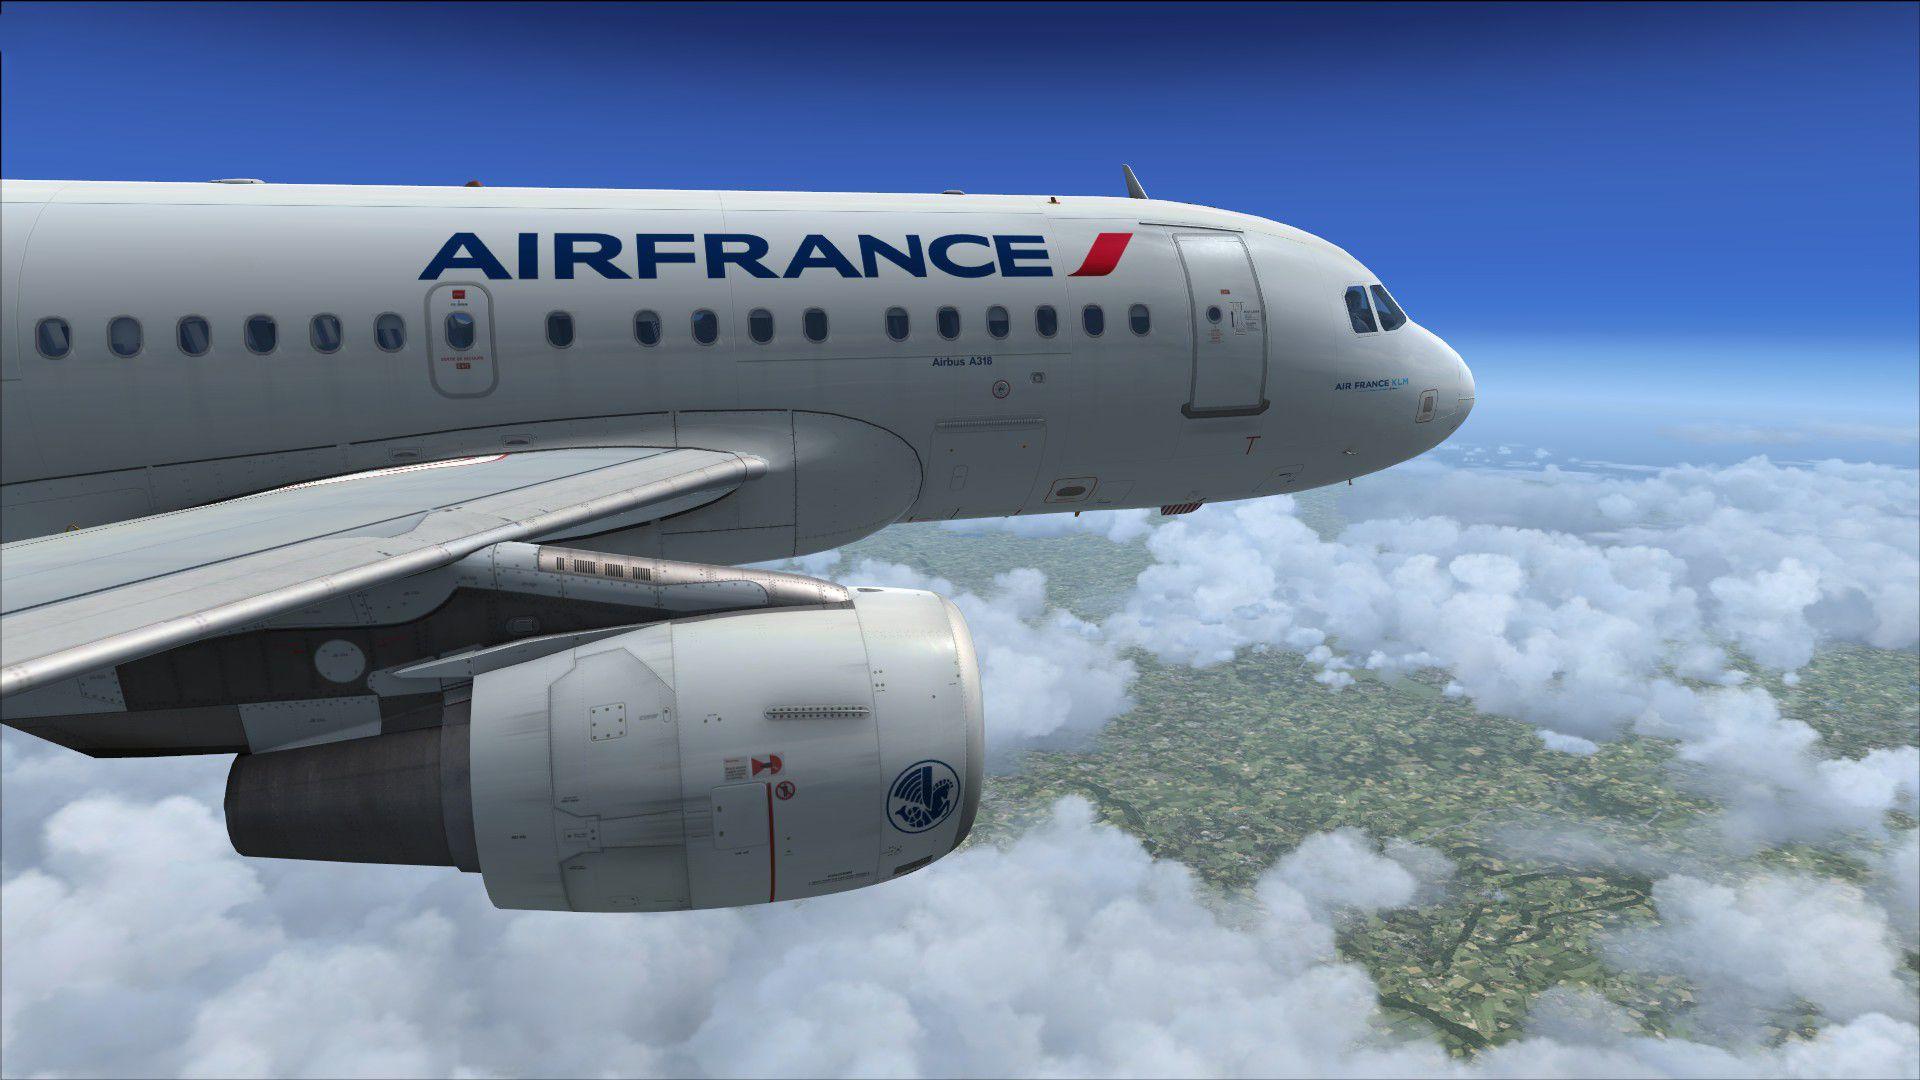 A3183194